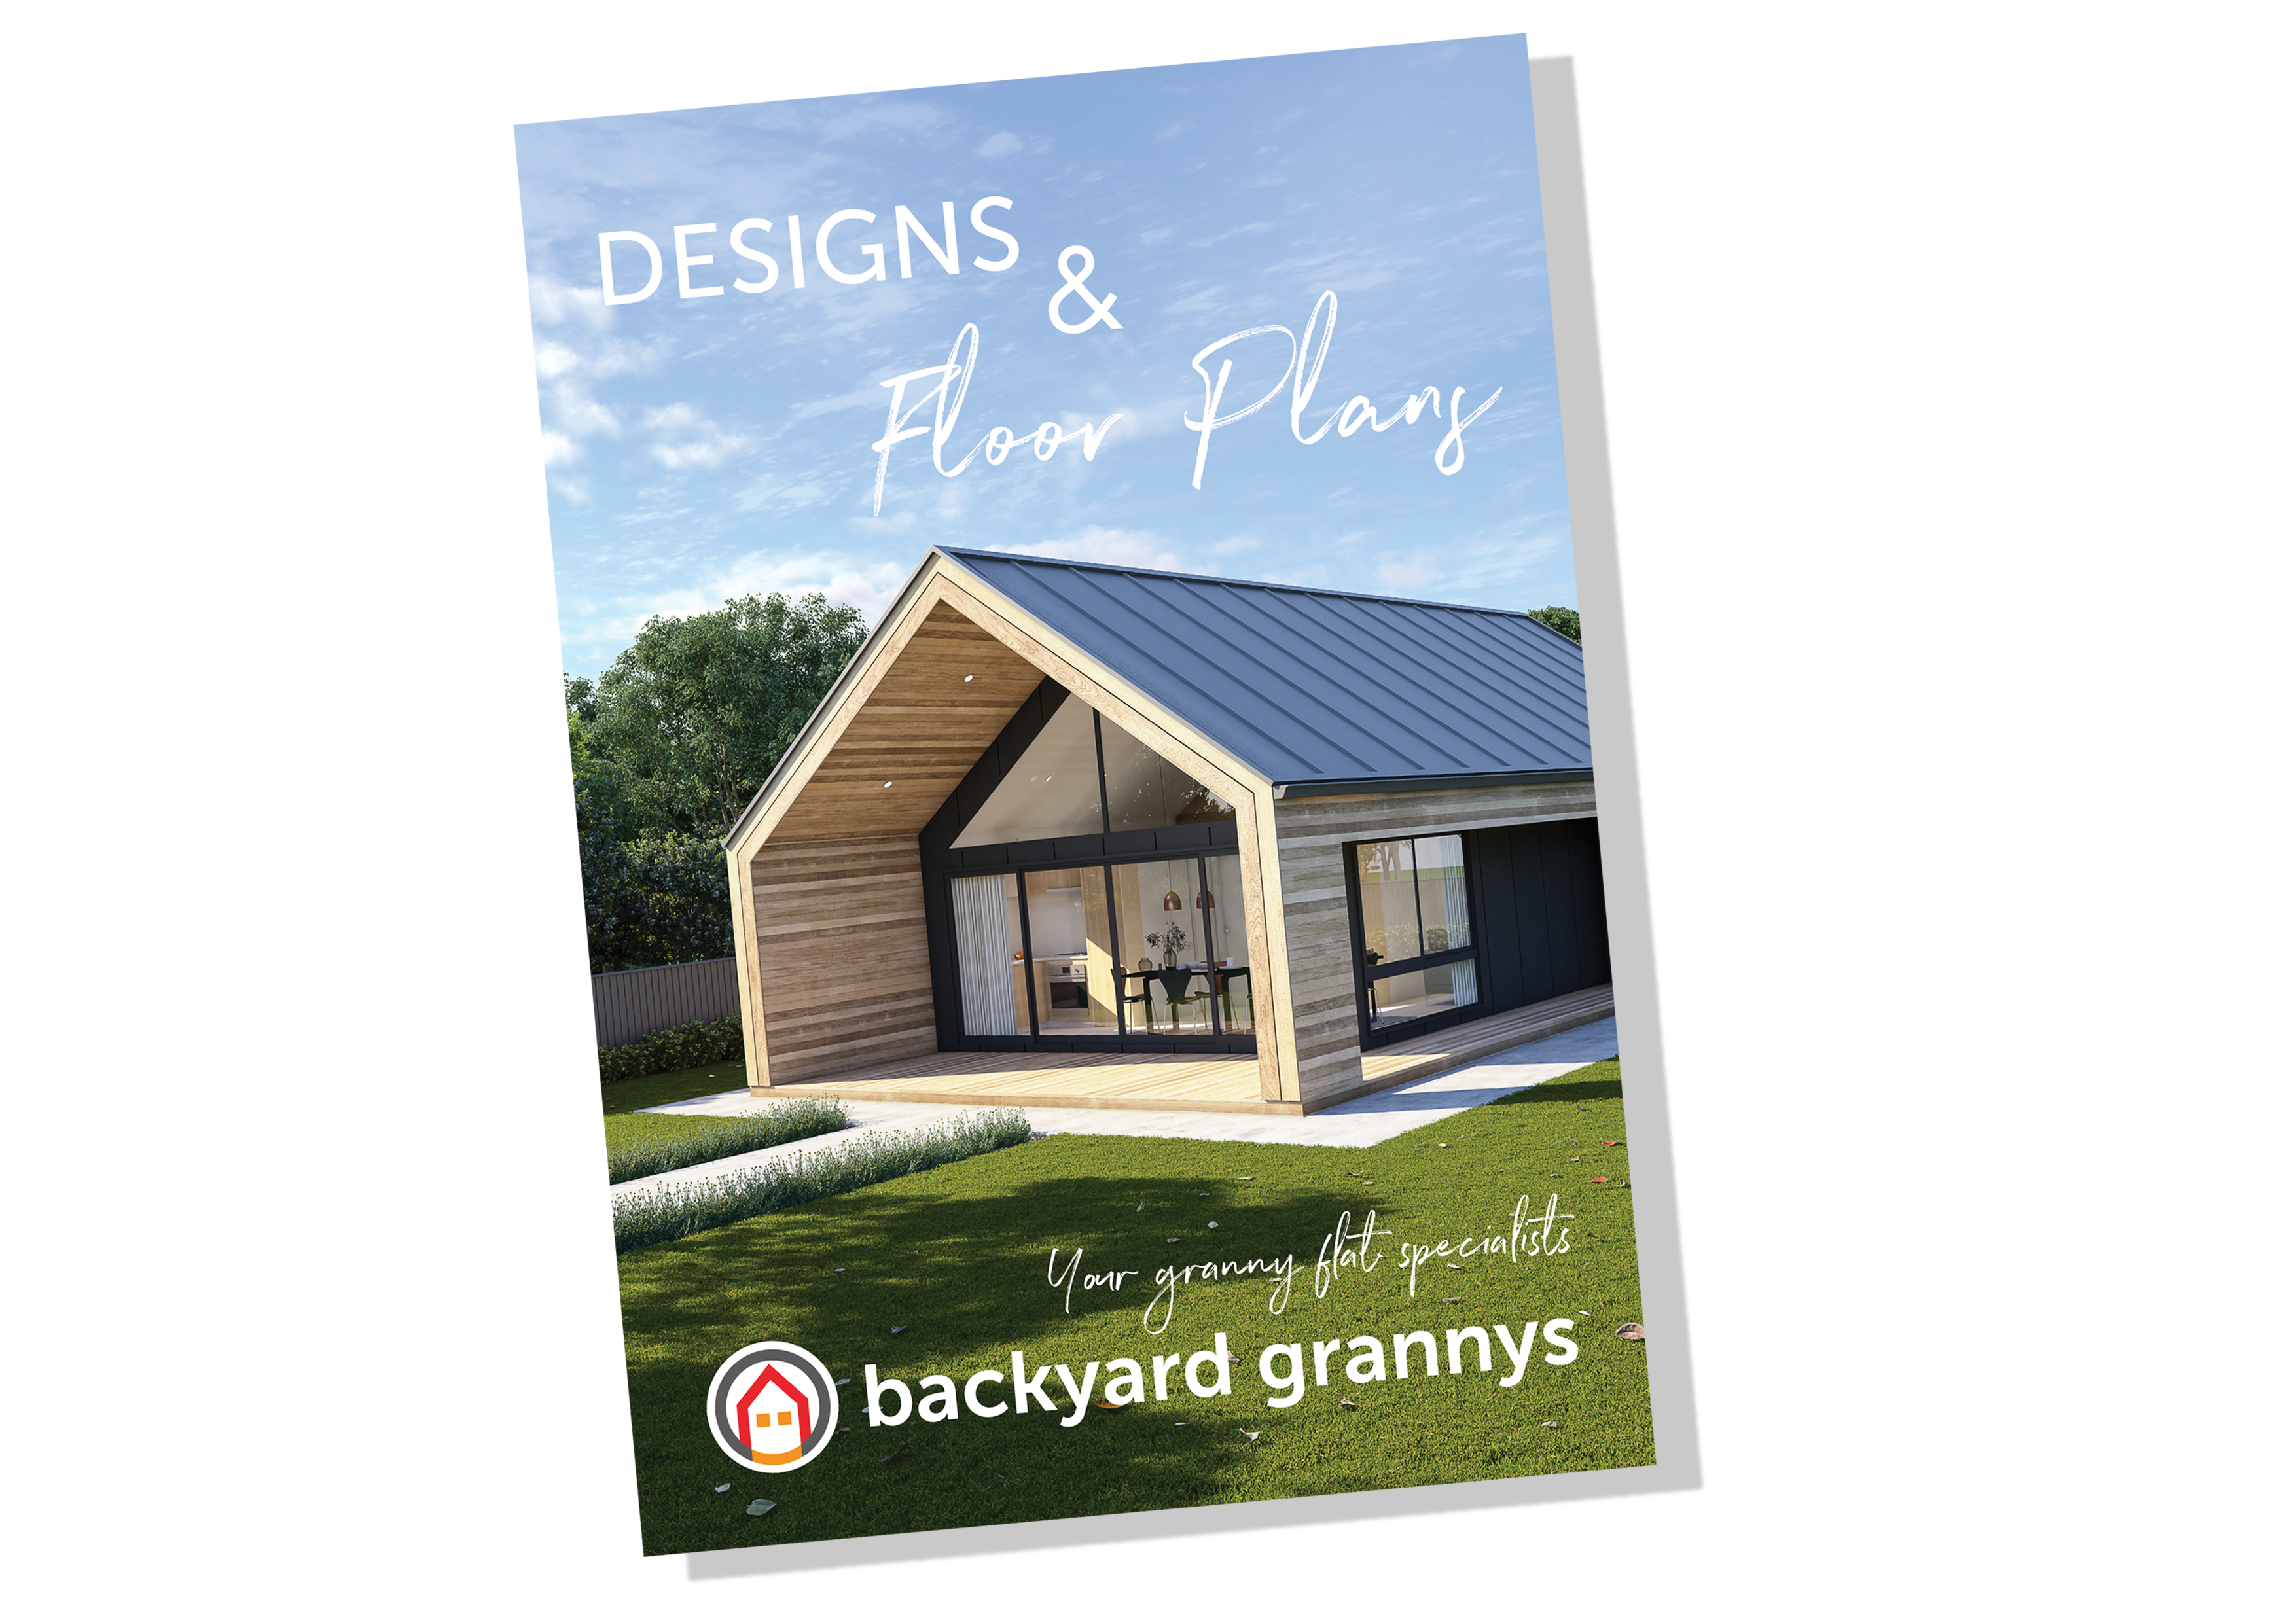 Designs Floorplans Front Page-1